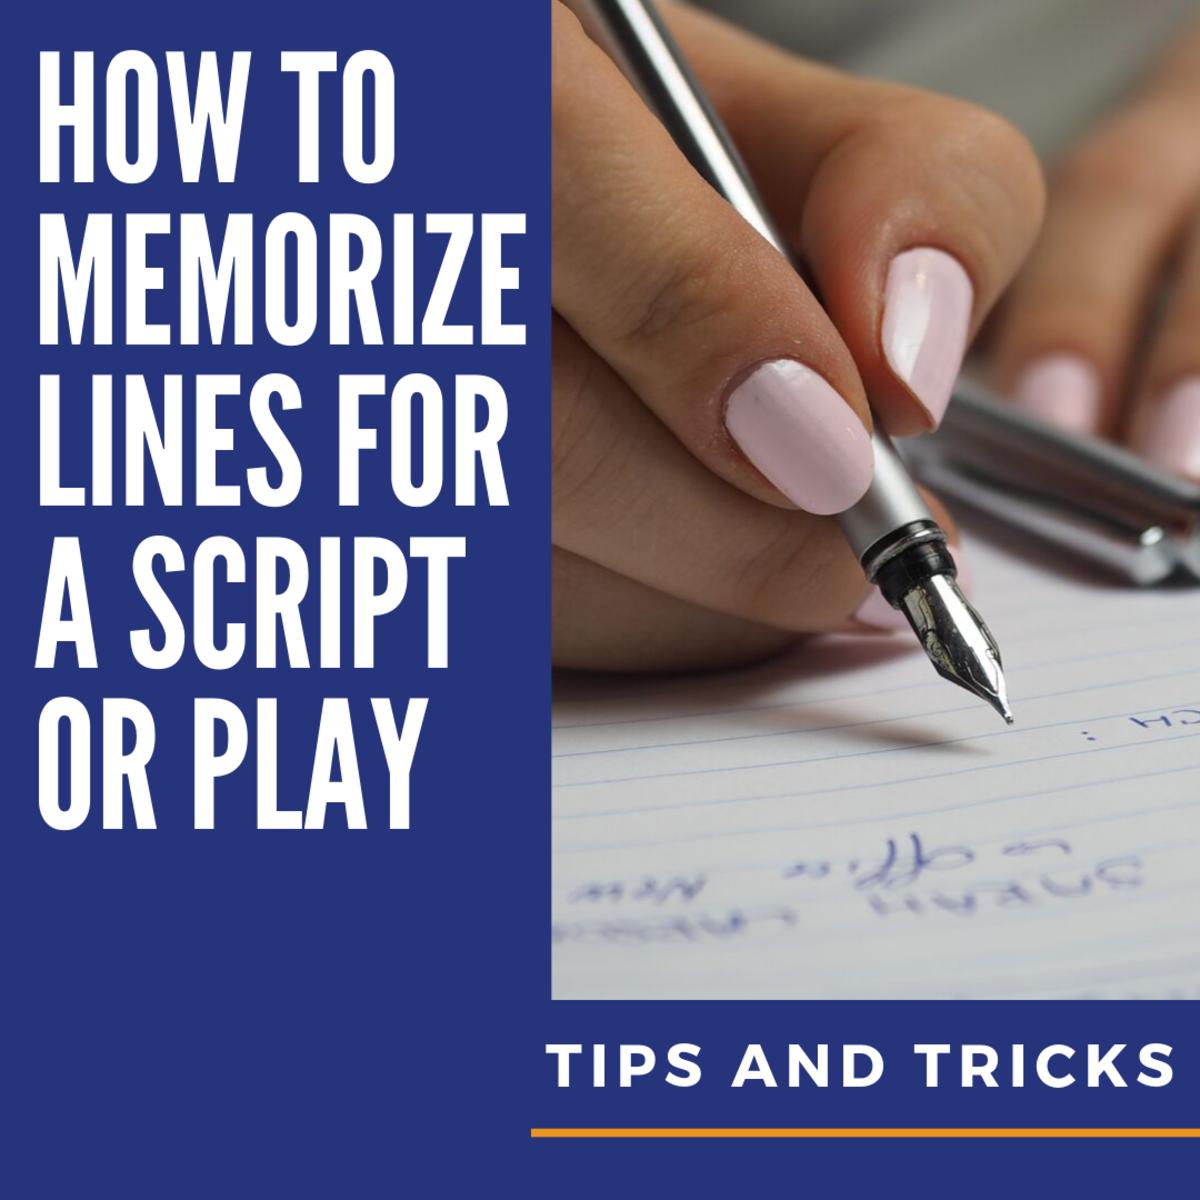 Tips for Memorization